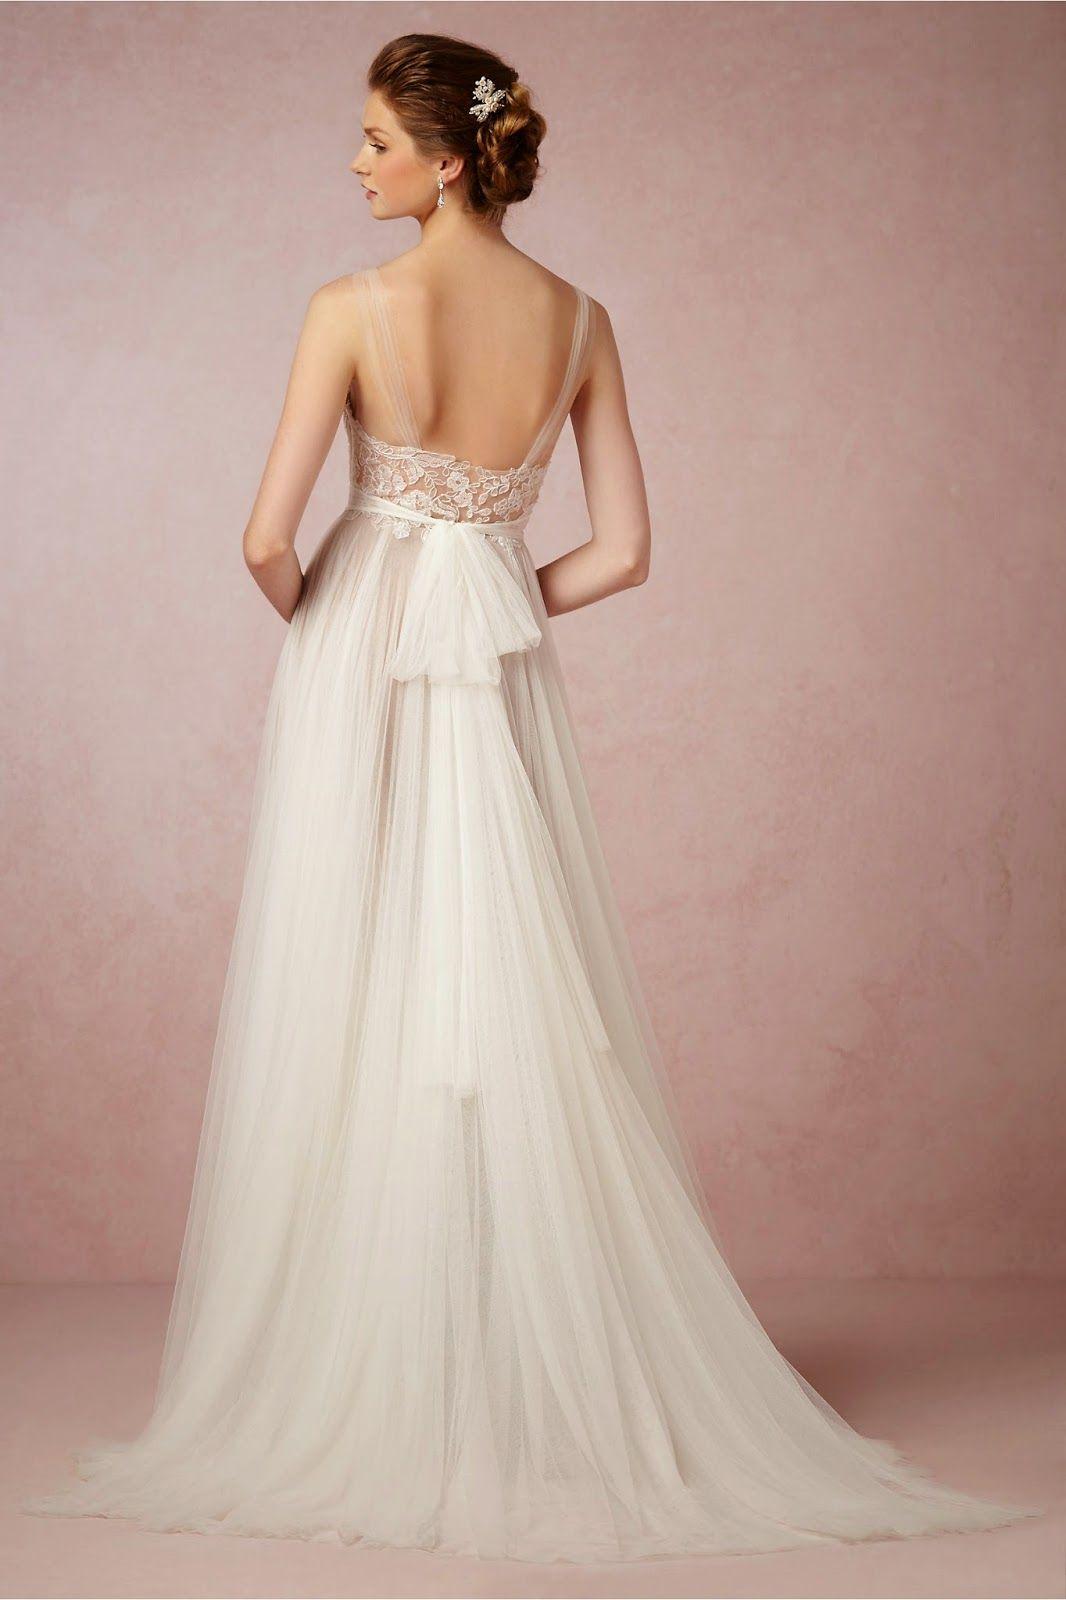 Pin de Olivia Patania en bride | Pinterest